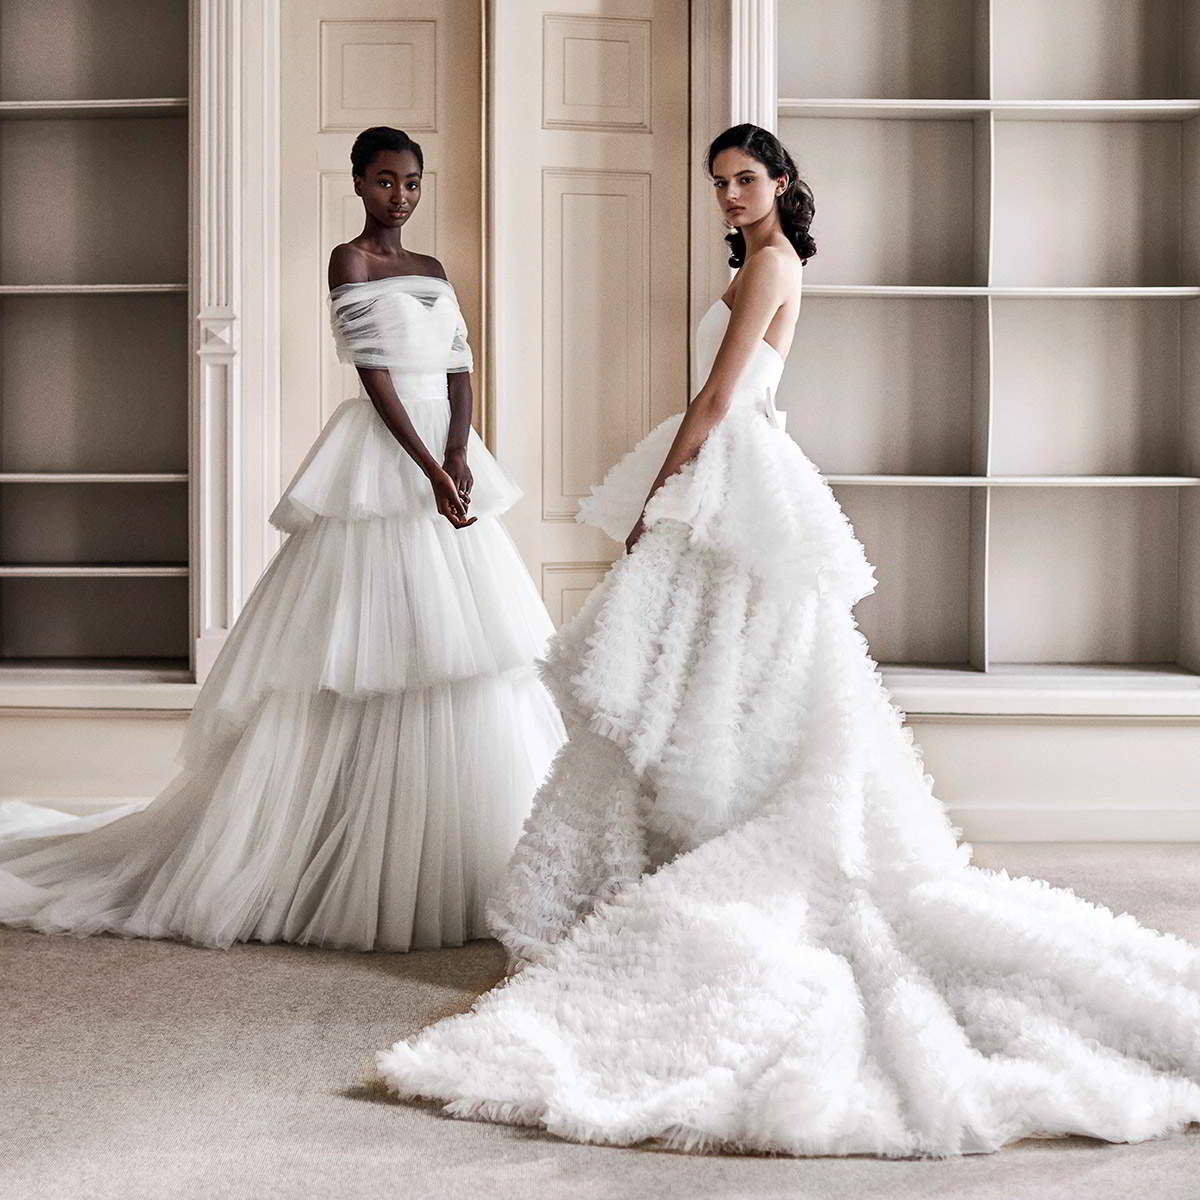 viktor rolf spring 2021 bridal collection featured on wedding inspirasi thumbnail